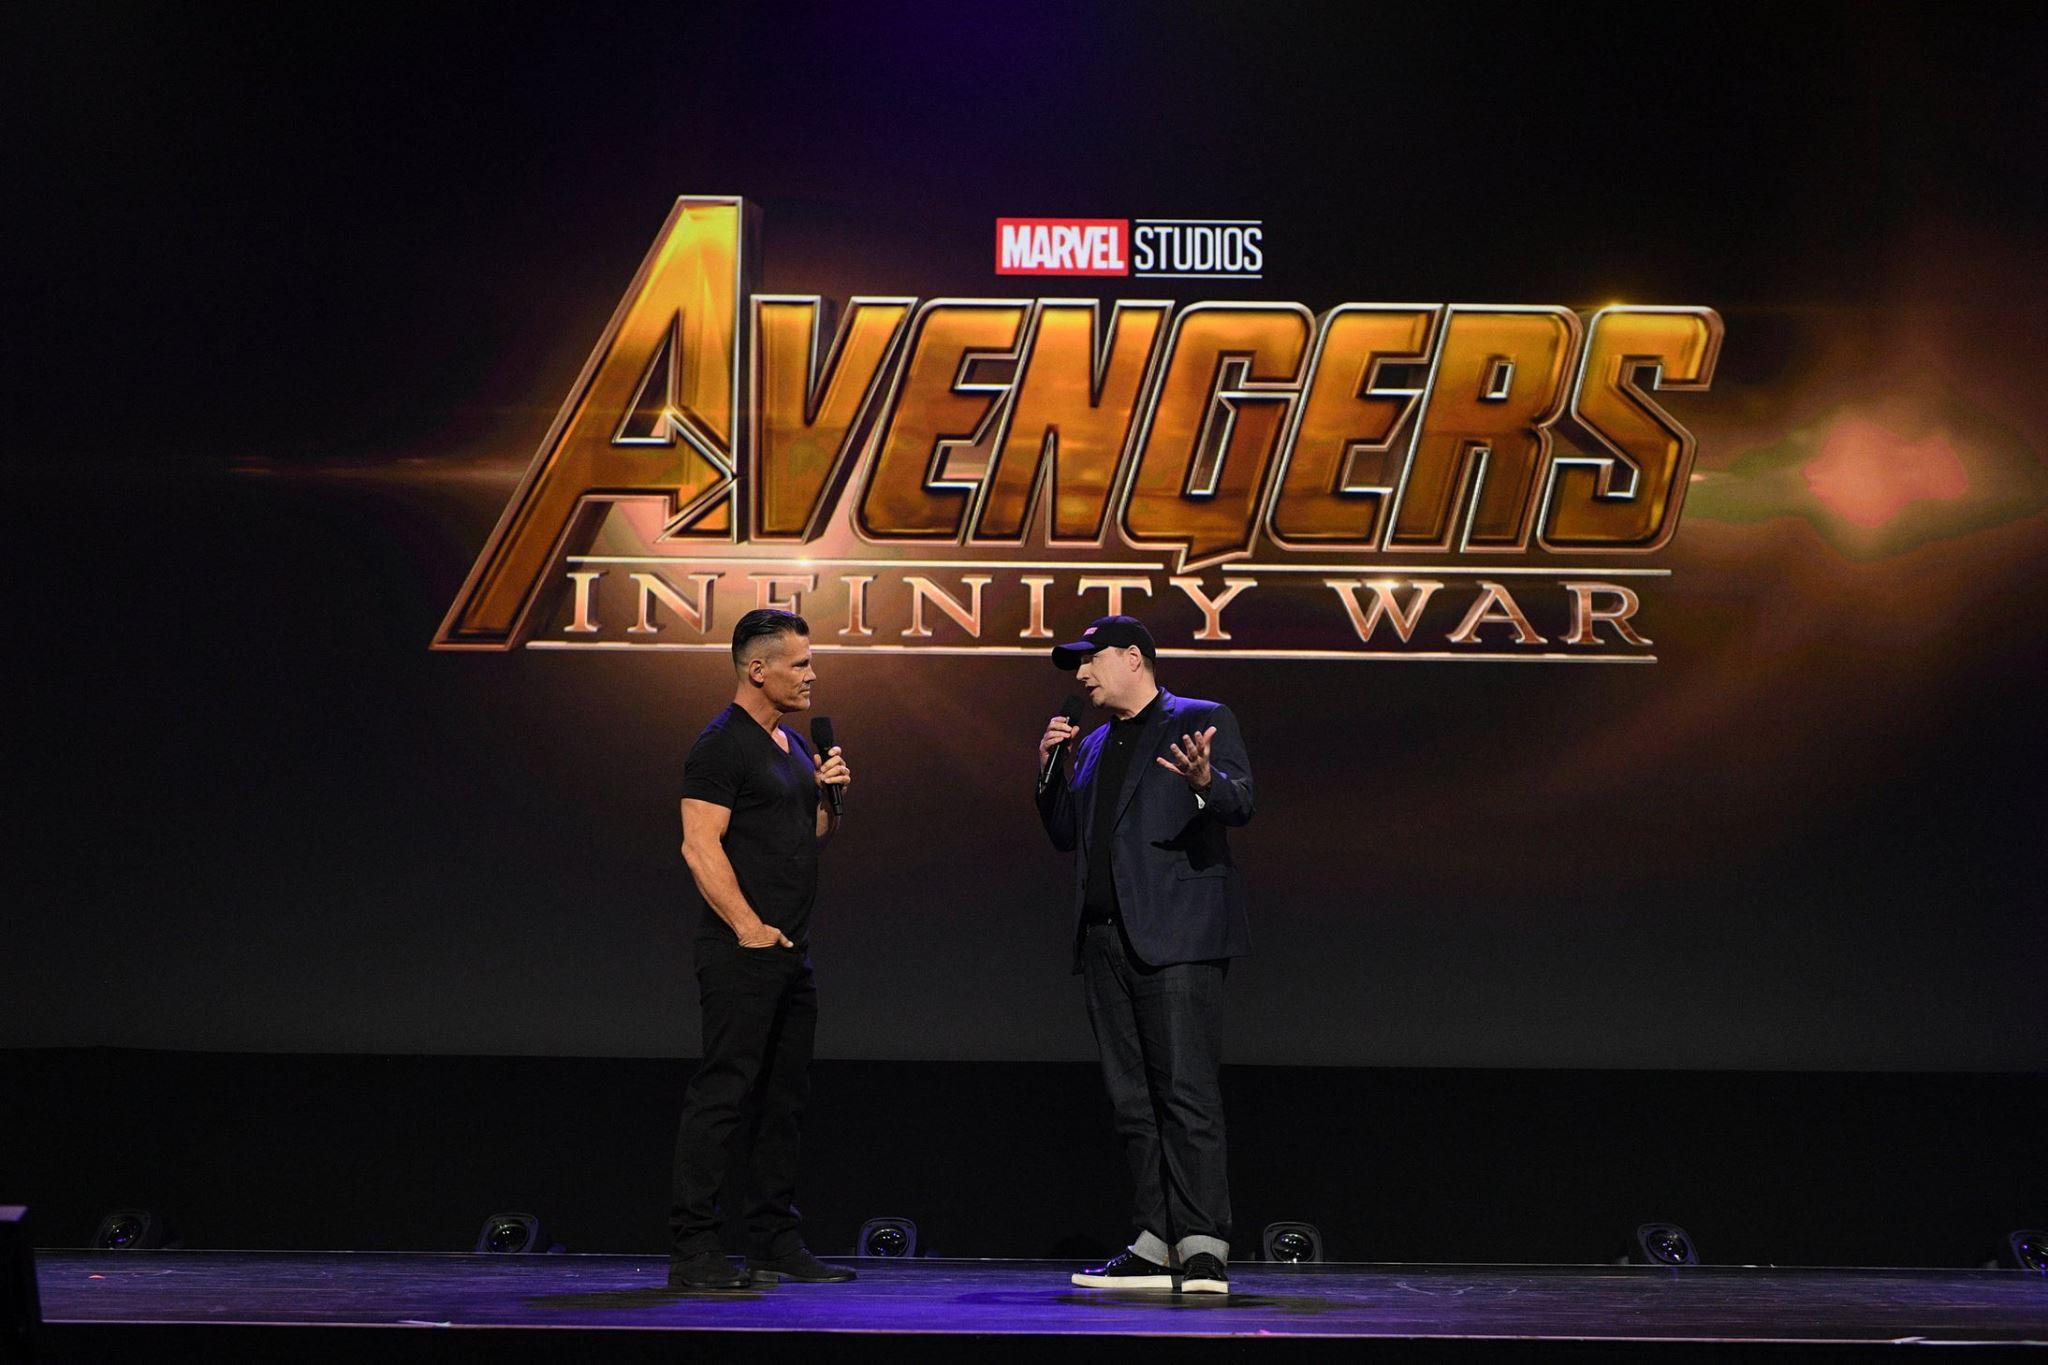 Photo du film Avengers: Infinity War au D23 2017 avec Josh Brolin et Kevin Feige